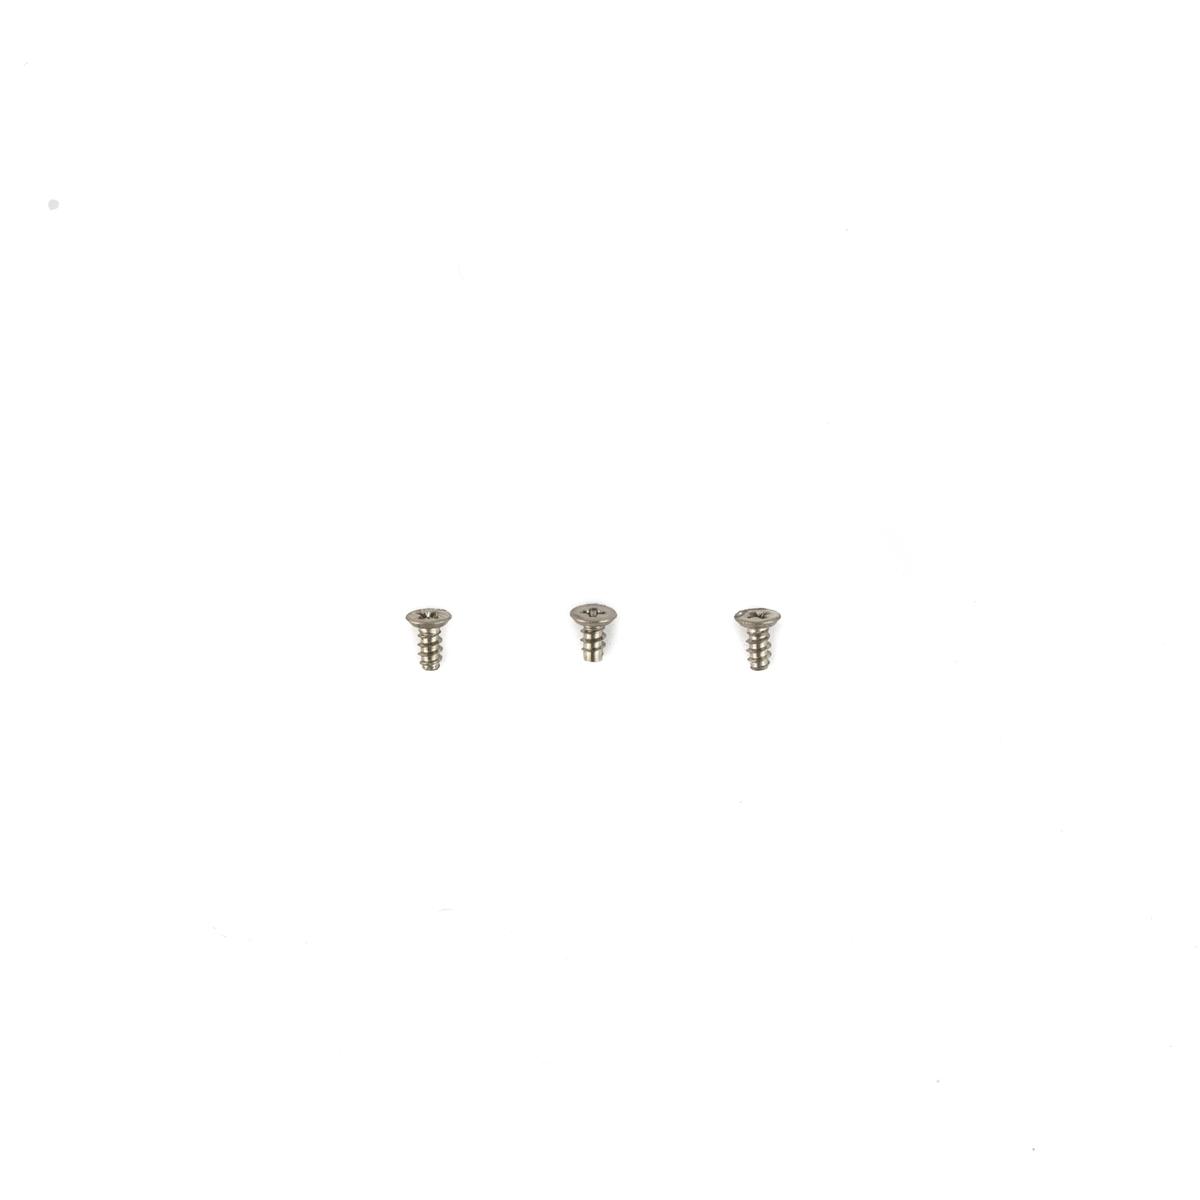 "Baxter AS50 Syringe Pump 4-40 x 1/2"" Flat Head Screw"